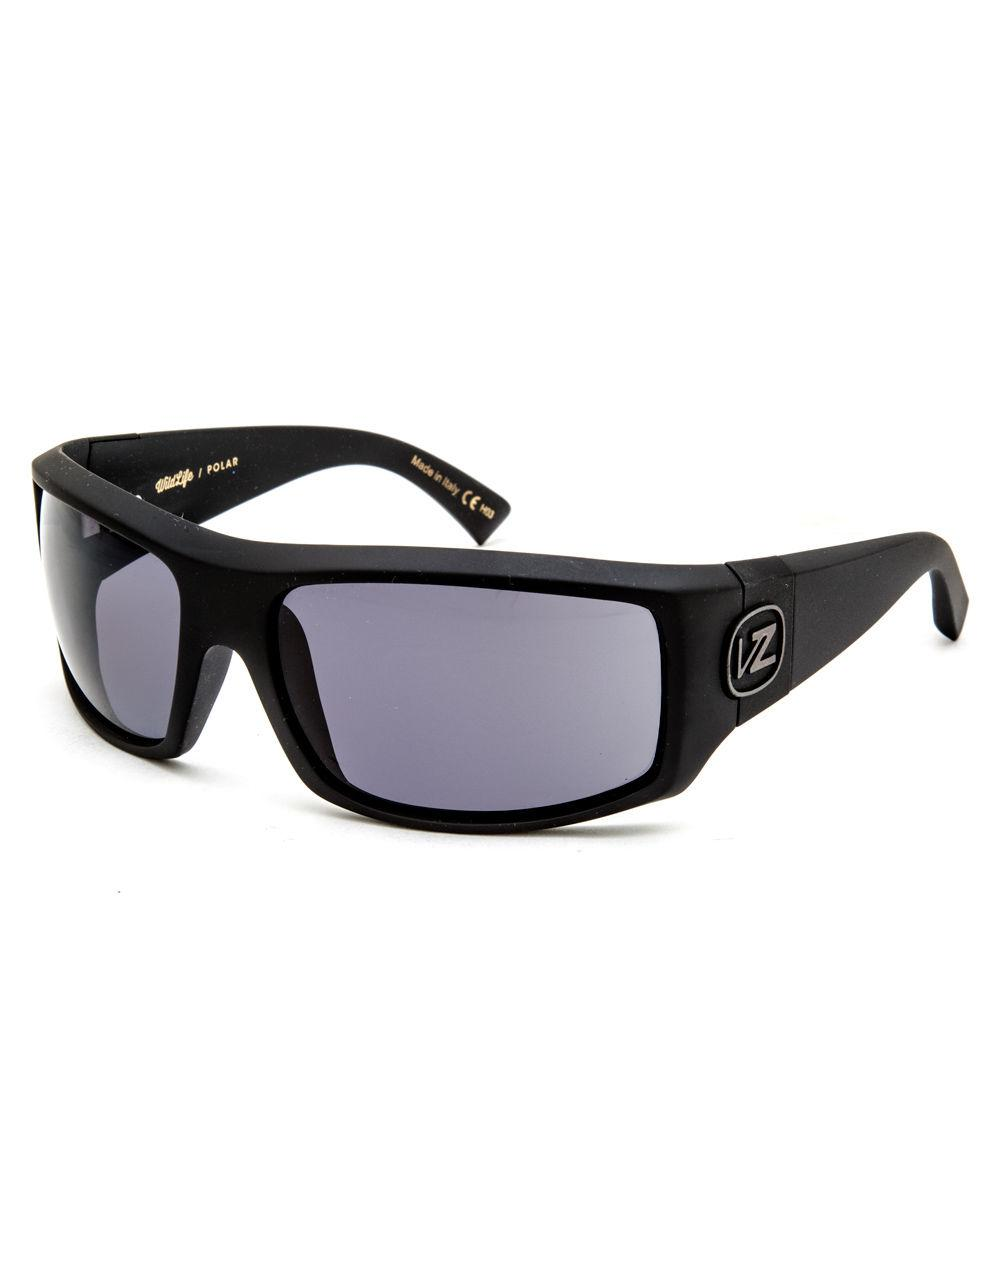 b7366629e6 Lyst - Von Zipper Clutch Matte Black   Grey Wildlife Sunglasses in ...